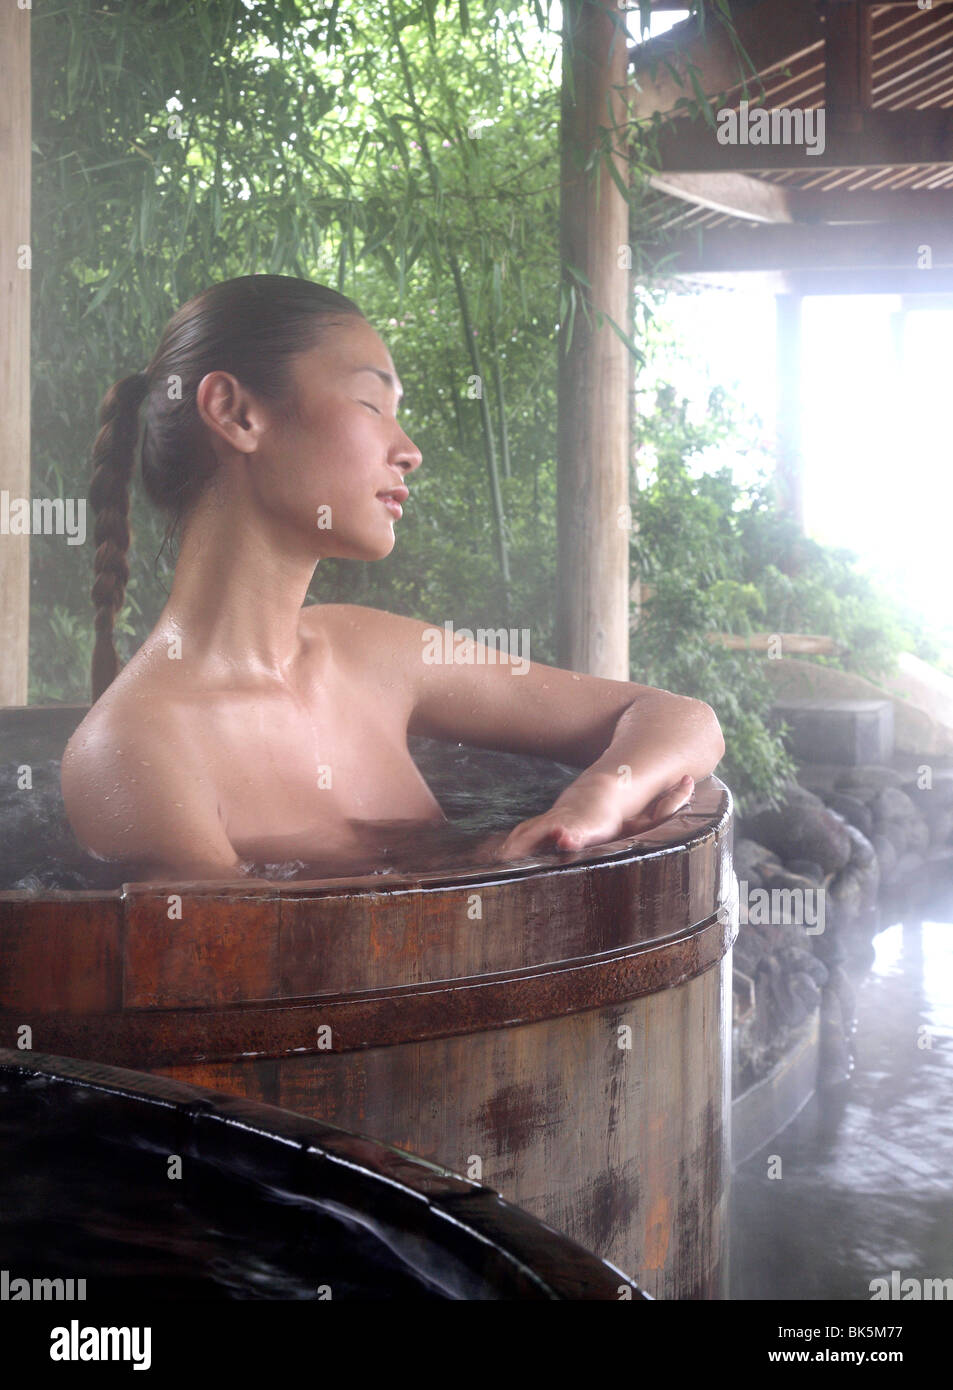 Thermalbad im brillanten Resort and Spa in Kunming, Provinz Yunnan, China, Asien Stockbild